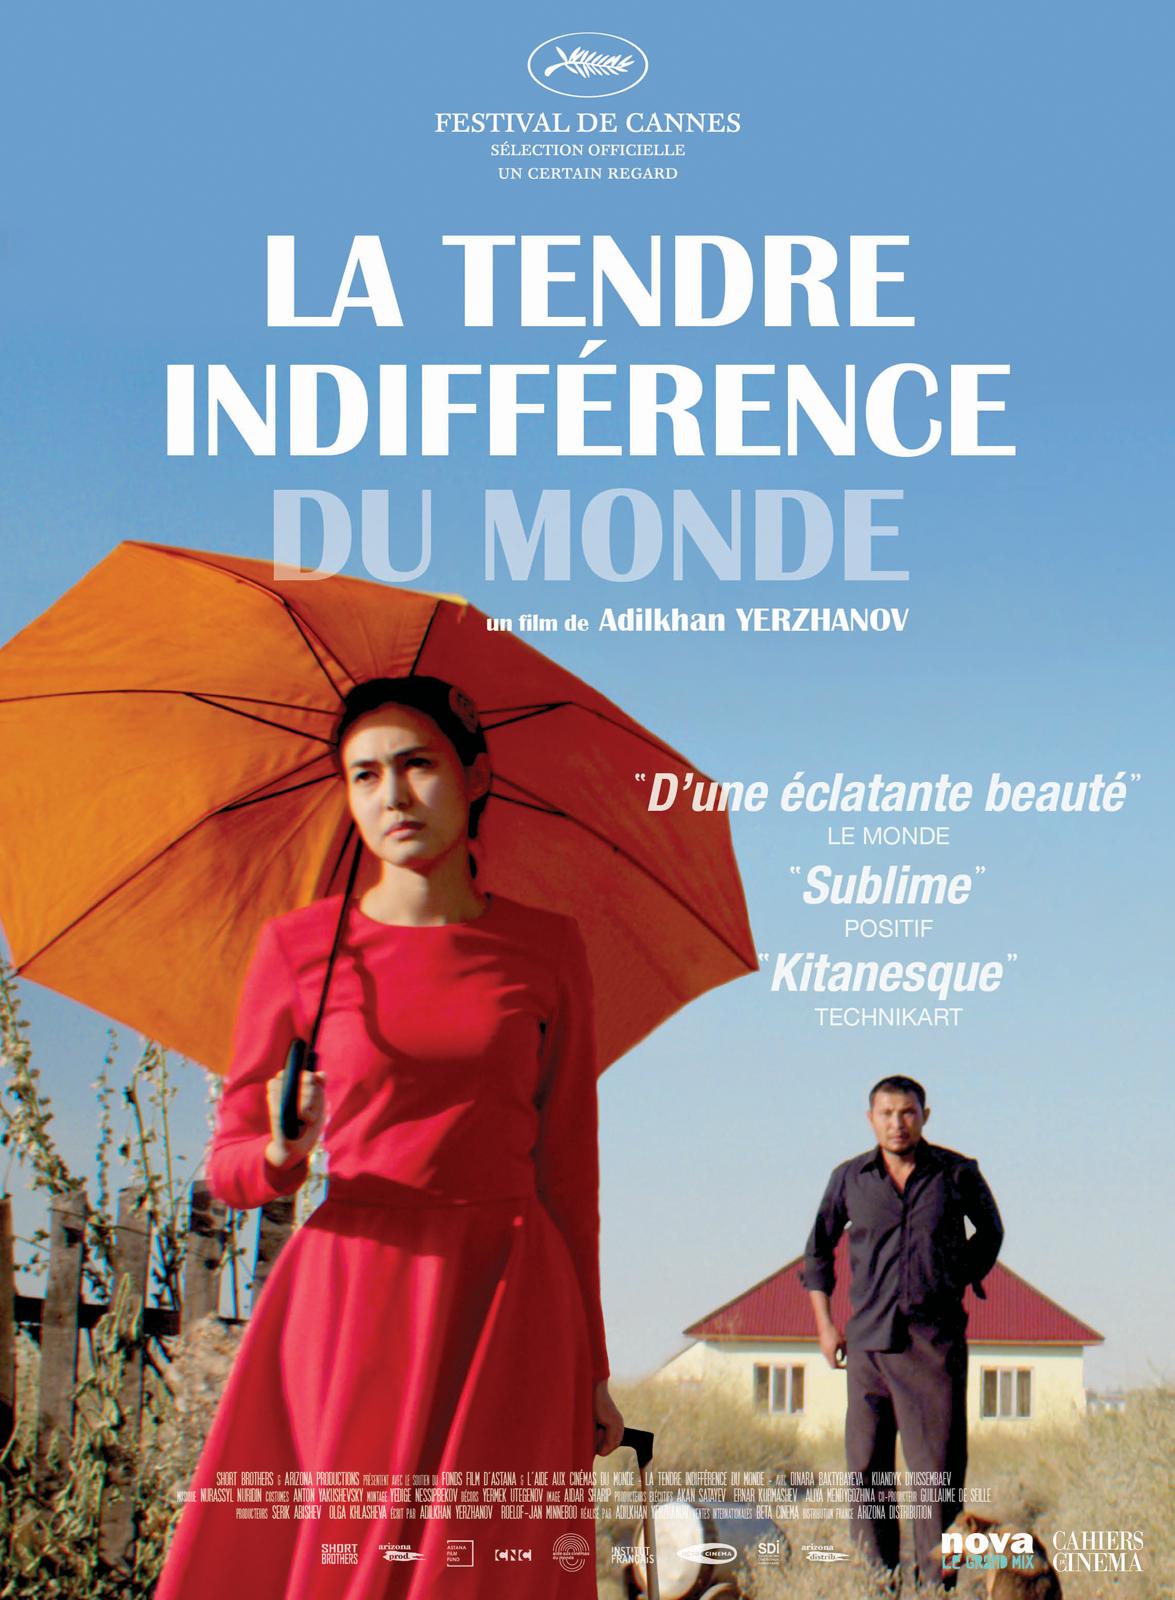 LA TENDRE INDIFFERENCE DU MONDE